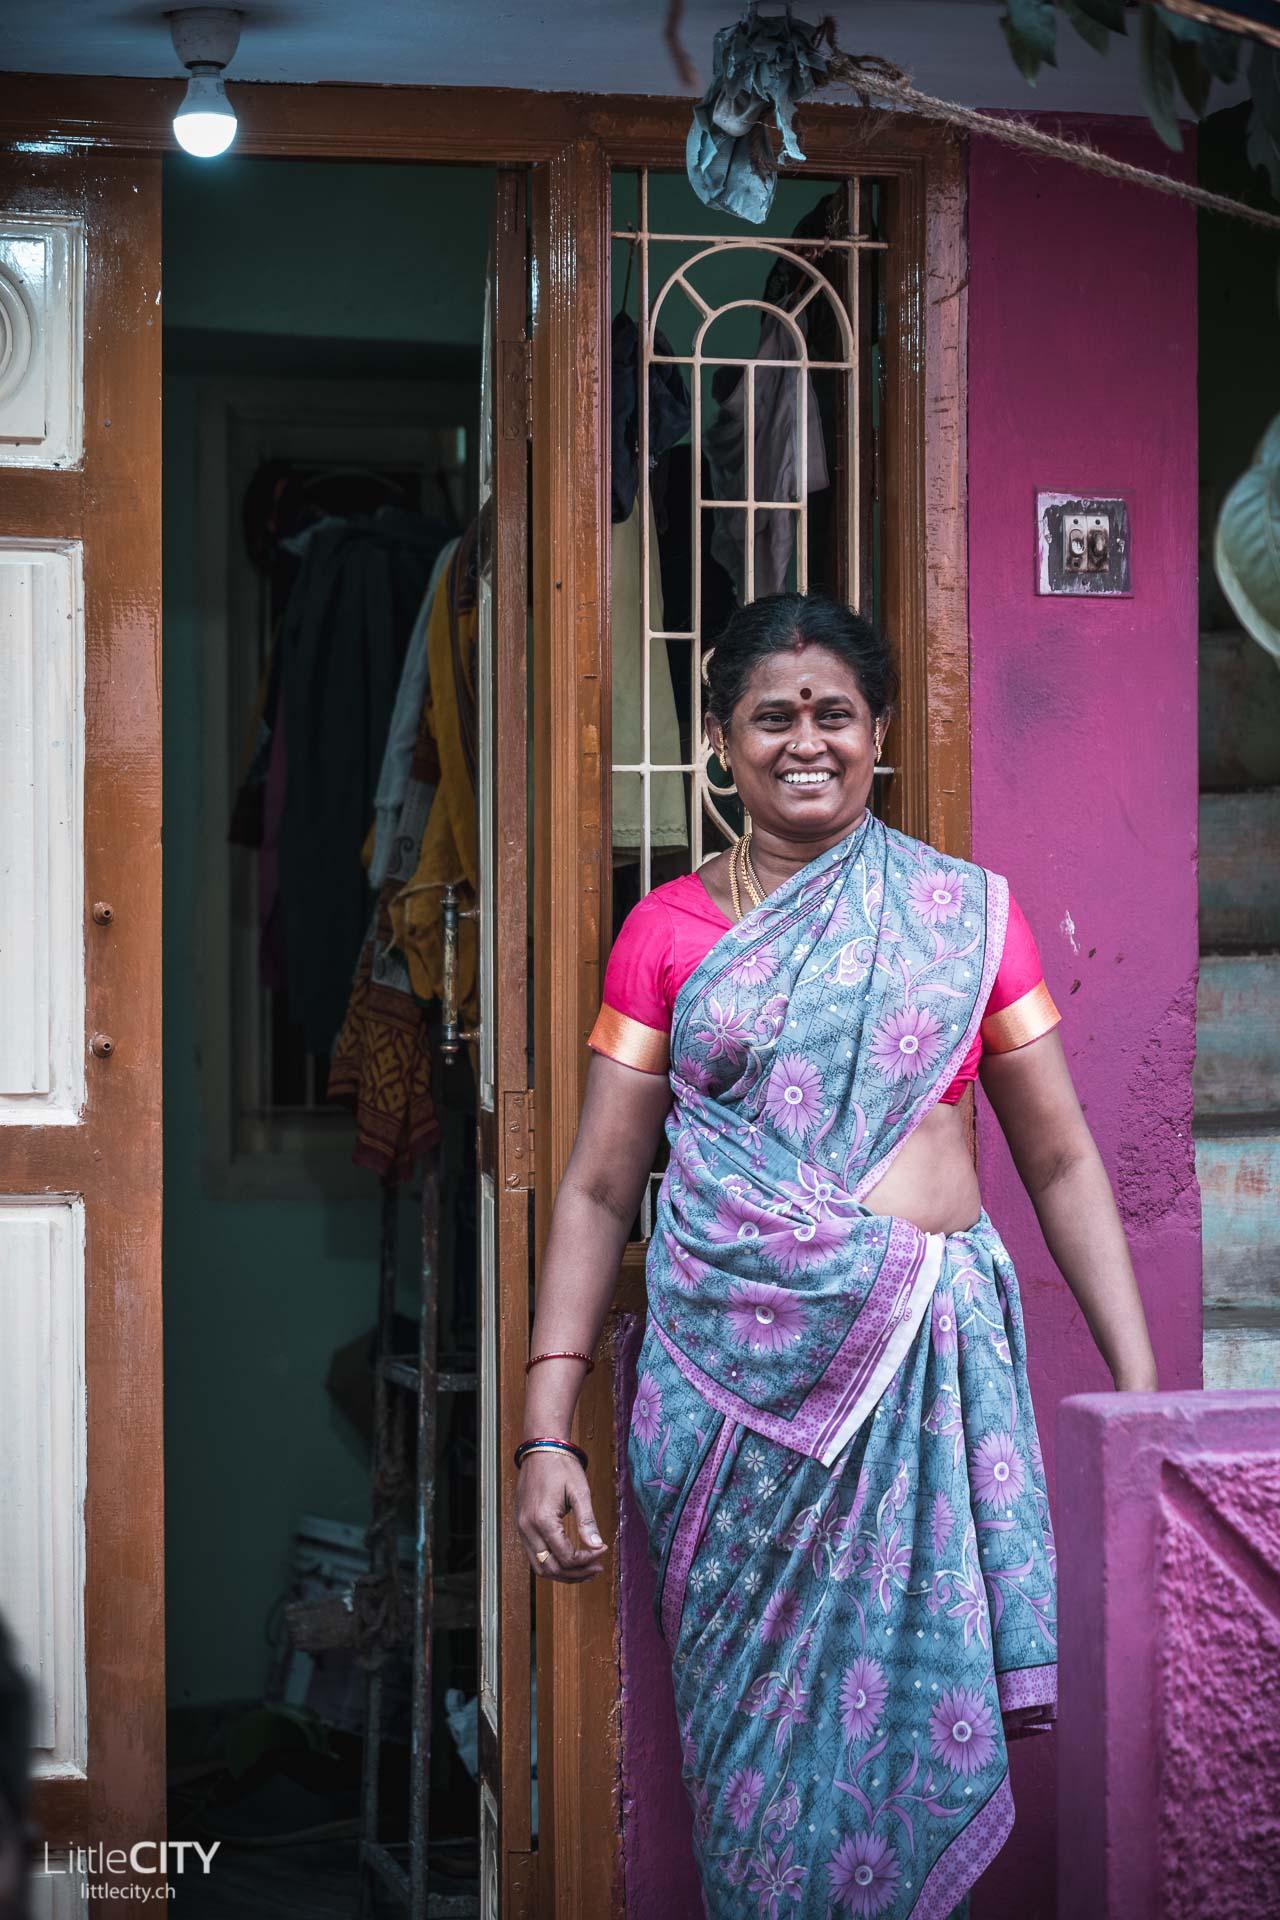 Madirai Tamil Nadu Indien Reise